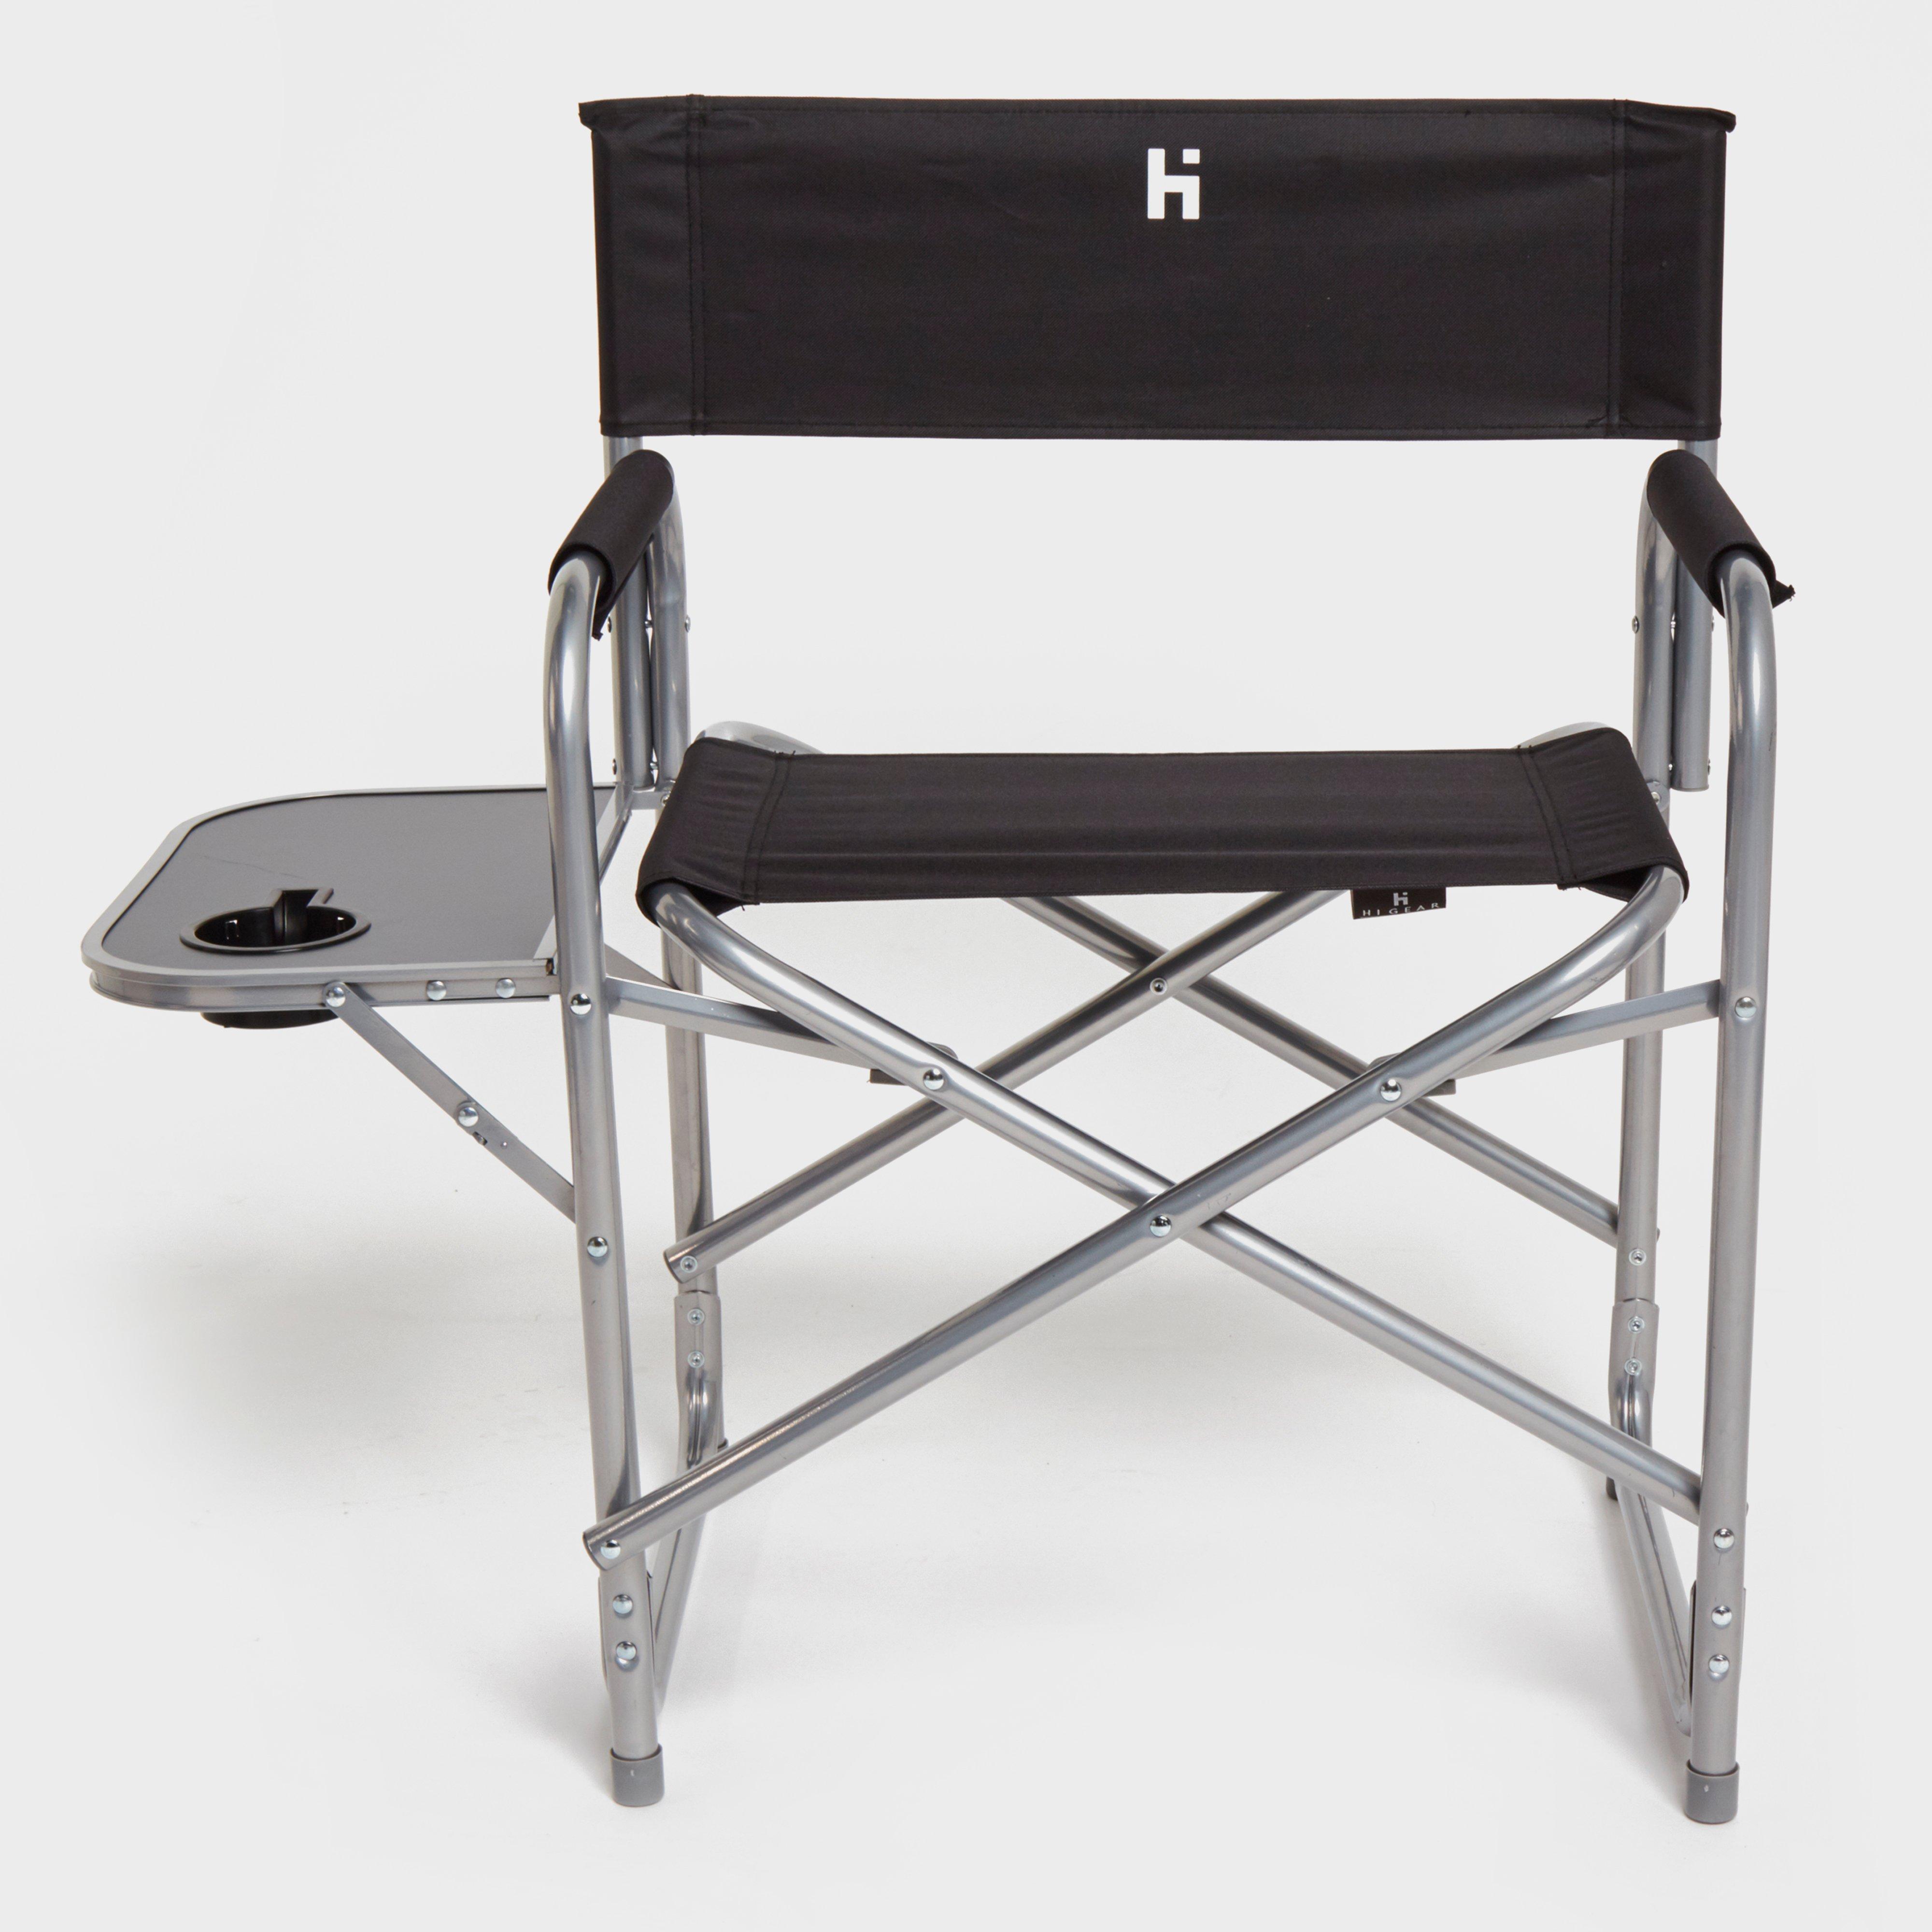 Hi-Gear Haddon Directors Chair - Black/Blk, Black